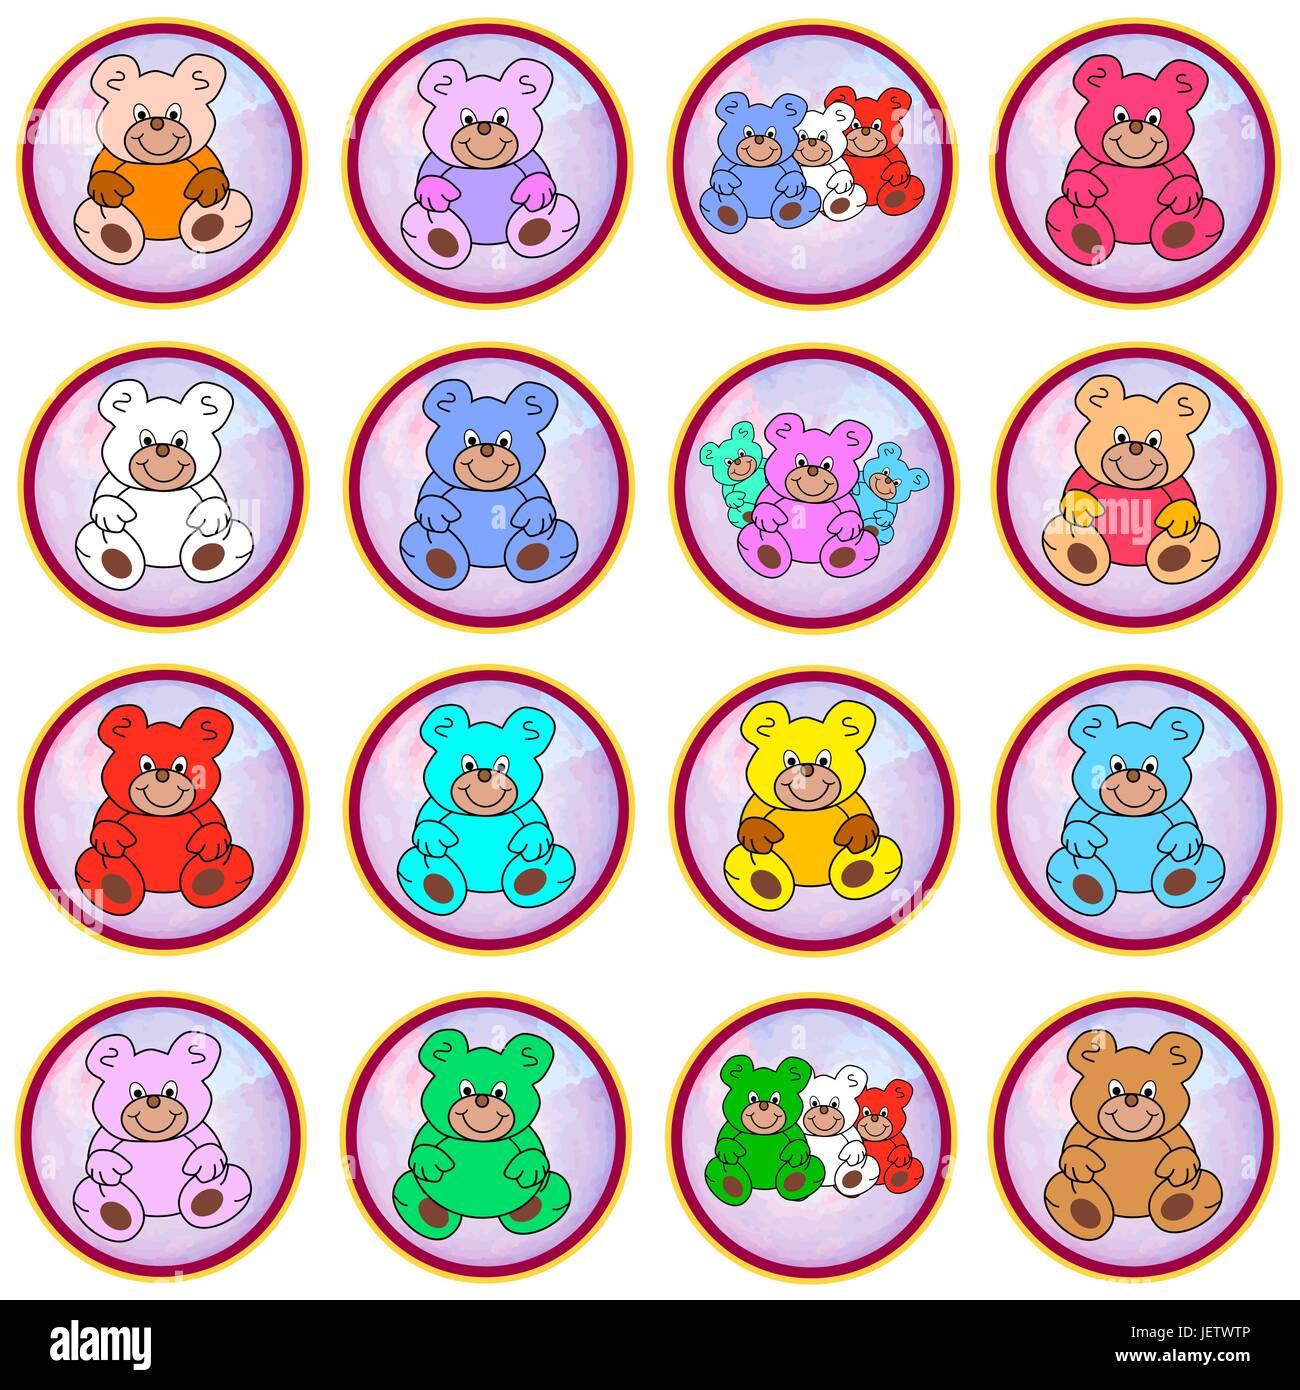 optional, bear, button, toys, teddies, cash, cold cash, money in cash, money, - Stock Image